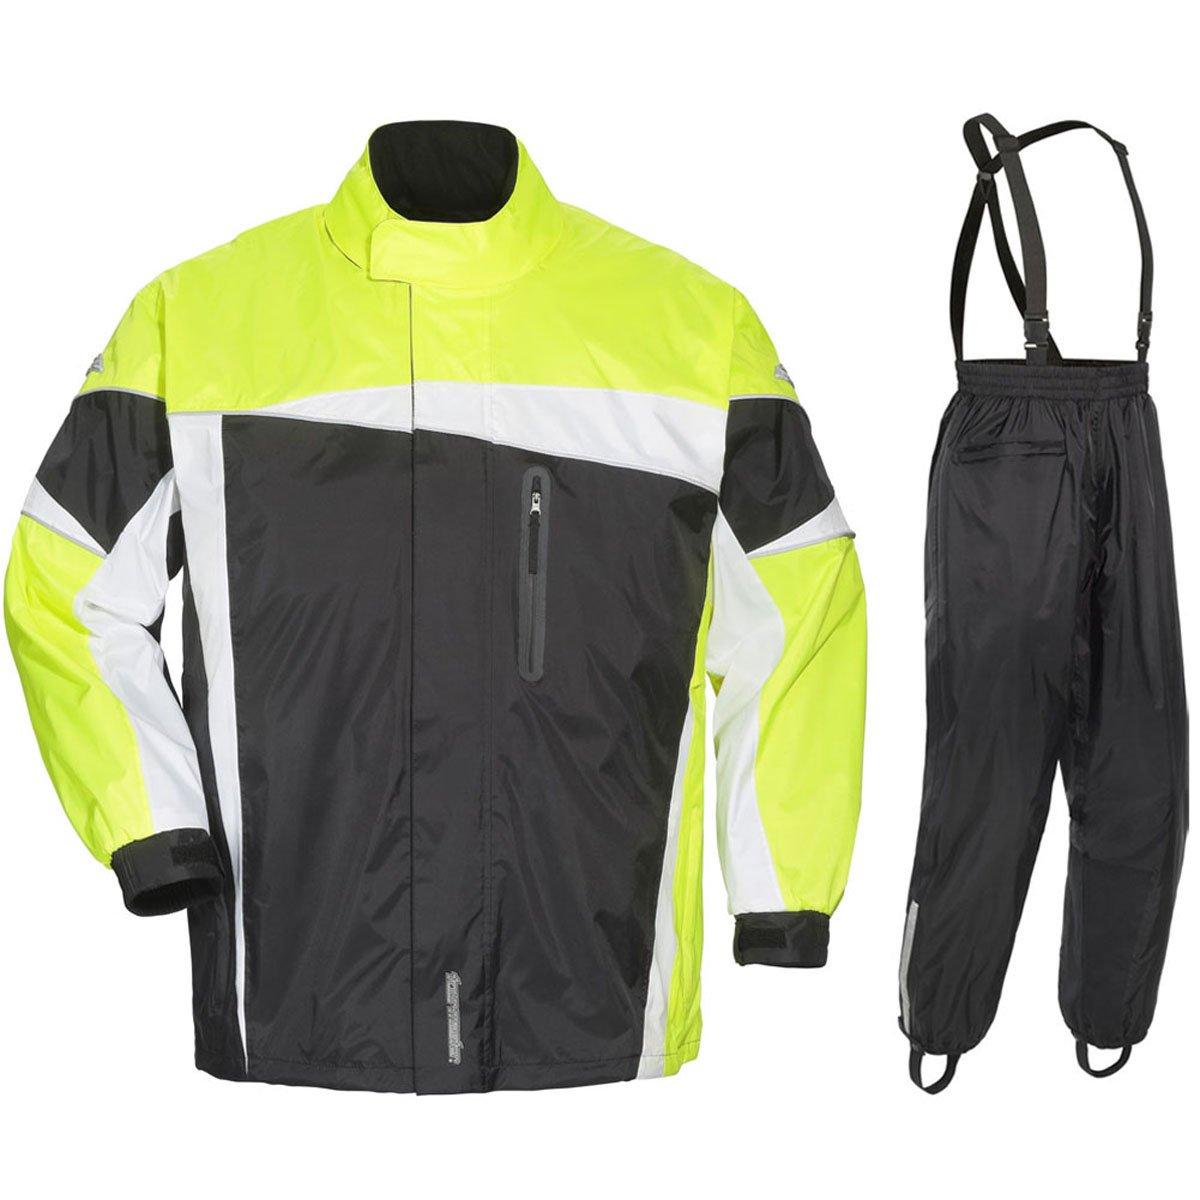 Tour Master Defender 2.0 Mens 2-Piece Street Bike Racing Motorcycle Rain Suit - Black/Hi-Viz/X-Large